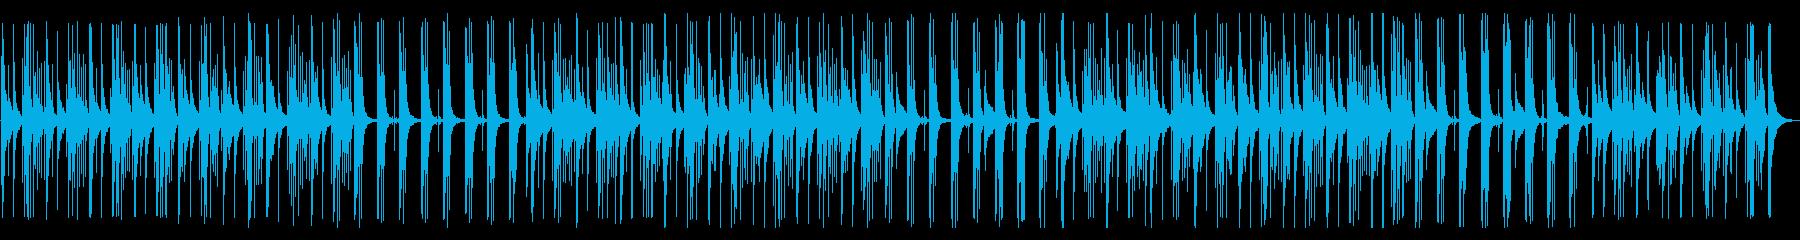 YouTube カリンバ・ほのぼのの再生済みの波形